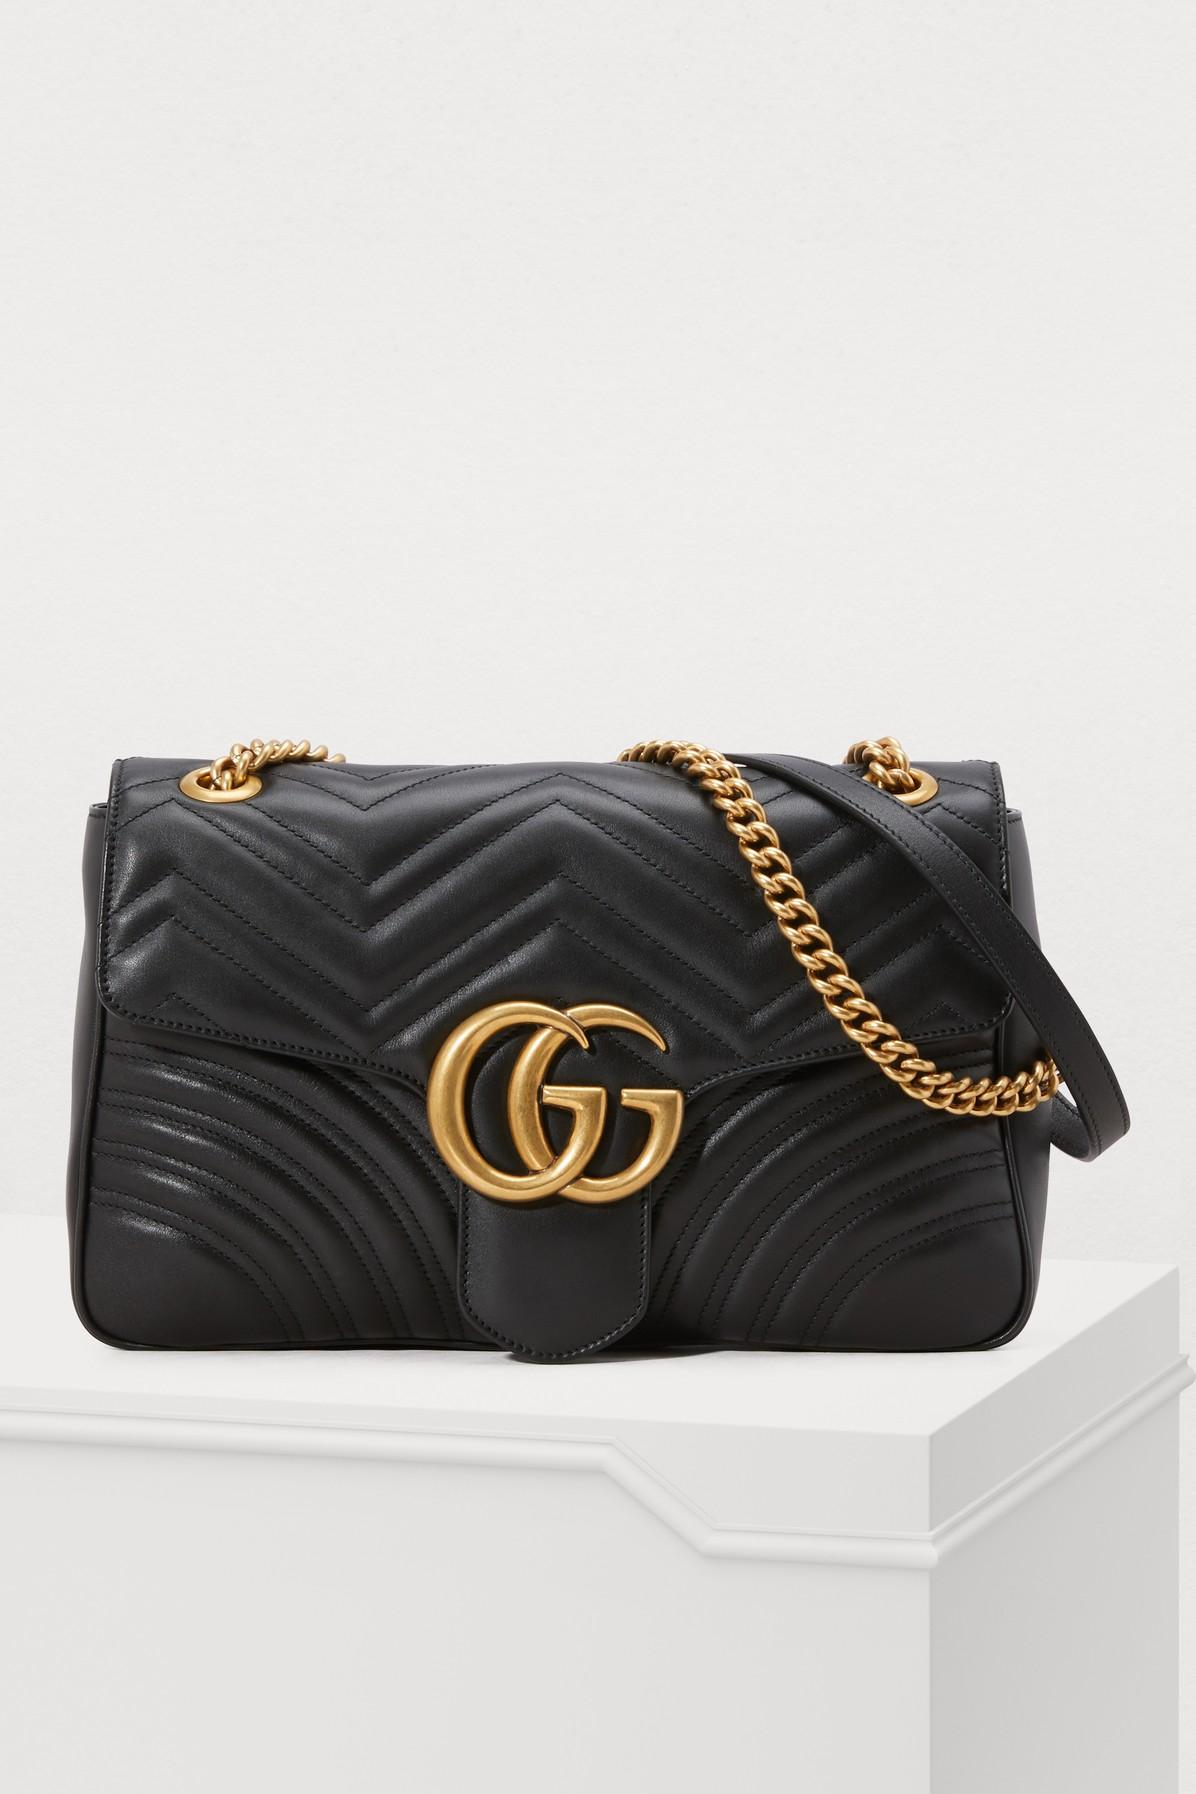 3f2c98ab44e Gucci Medium Gg Marmont 2.0 Matelasse Leather Shoulder Bag - Black ...